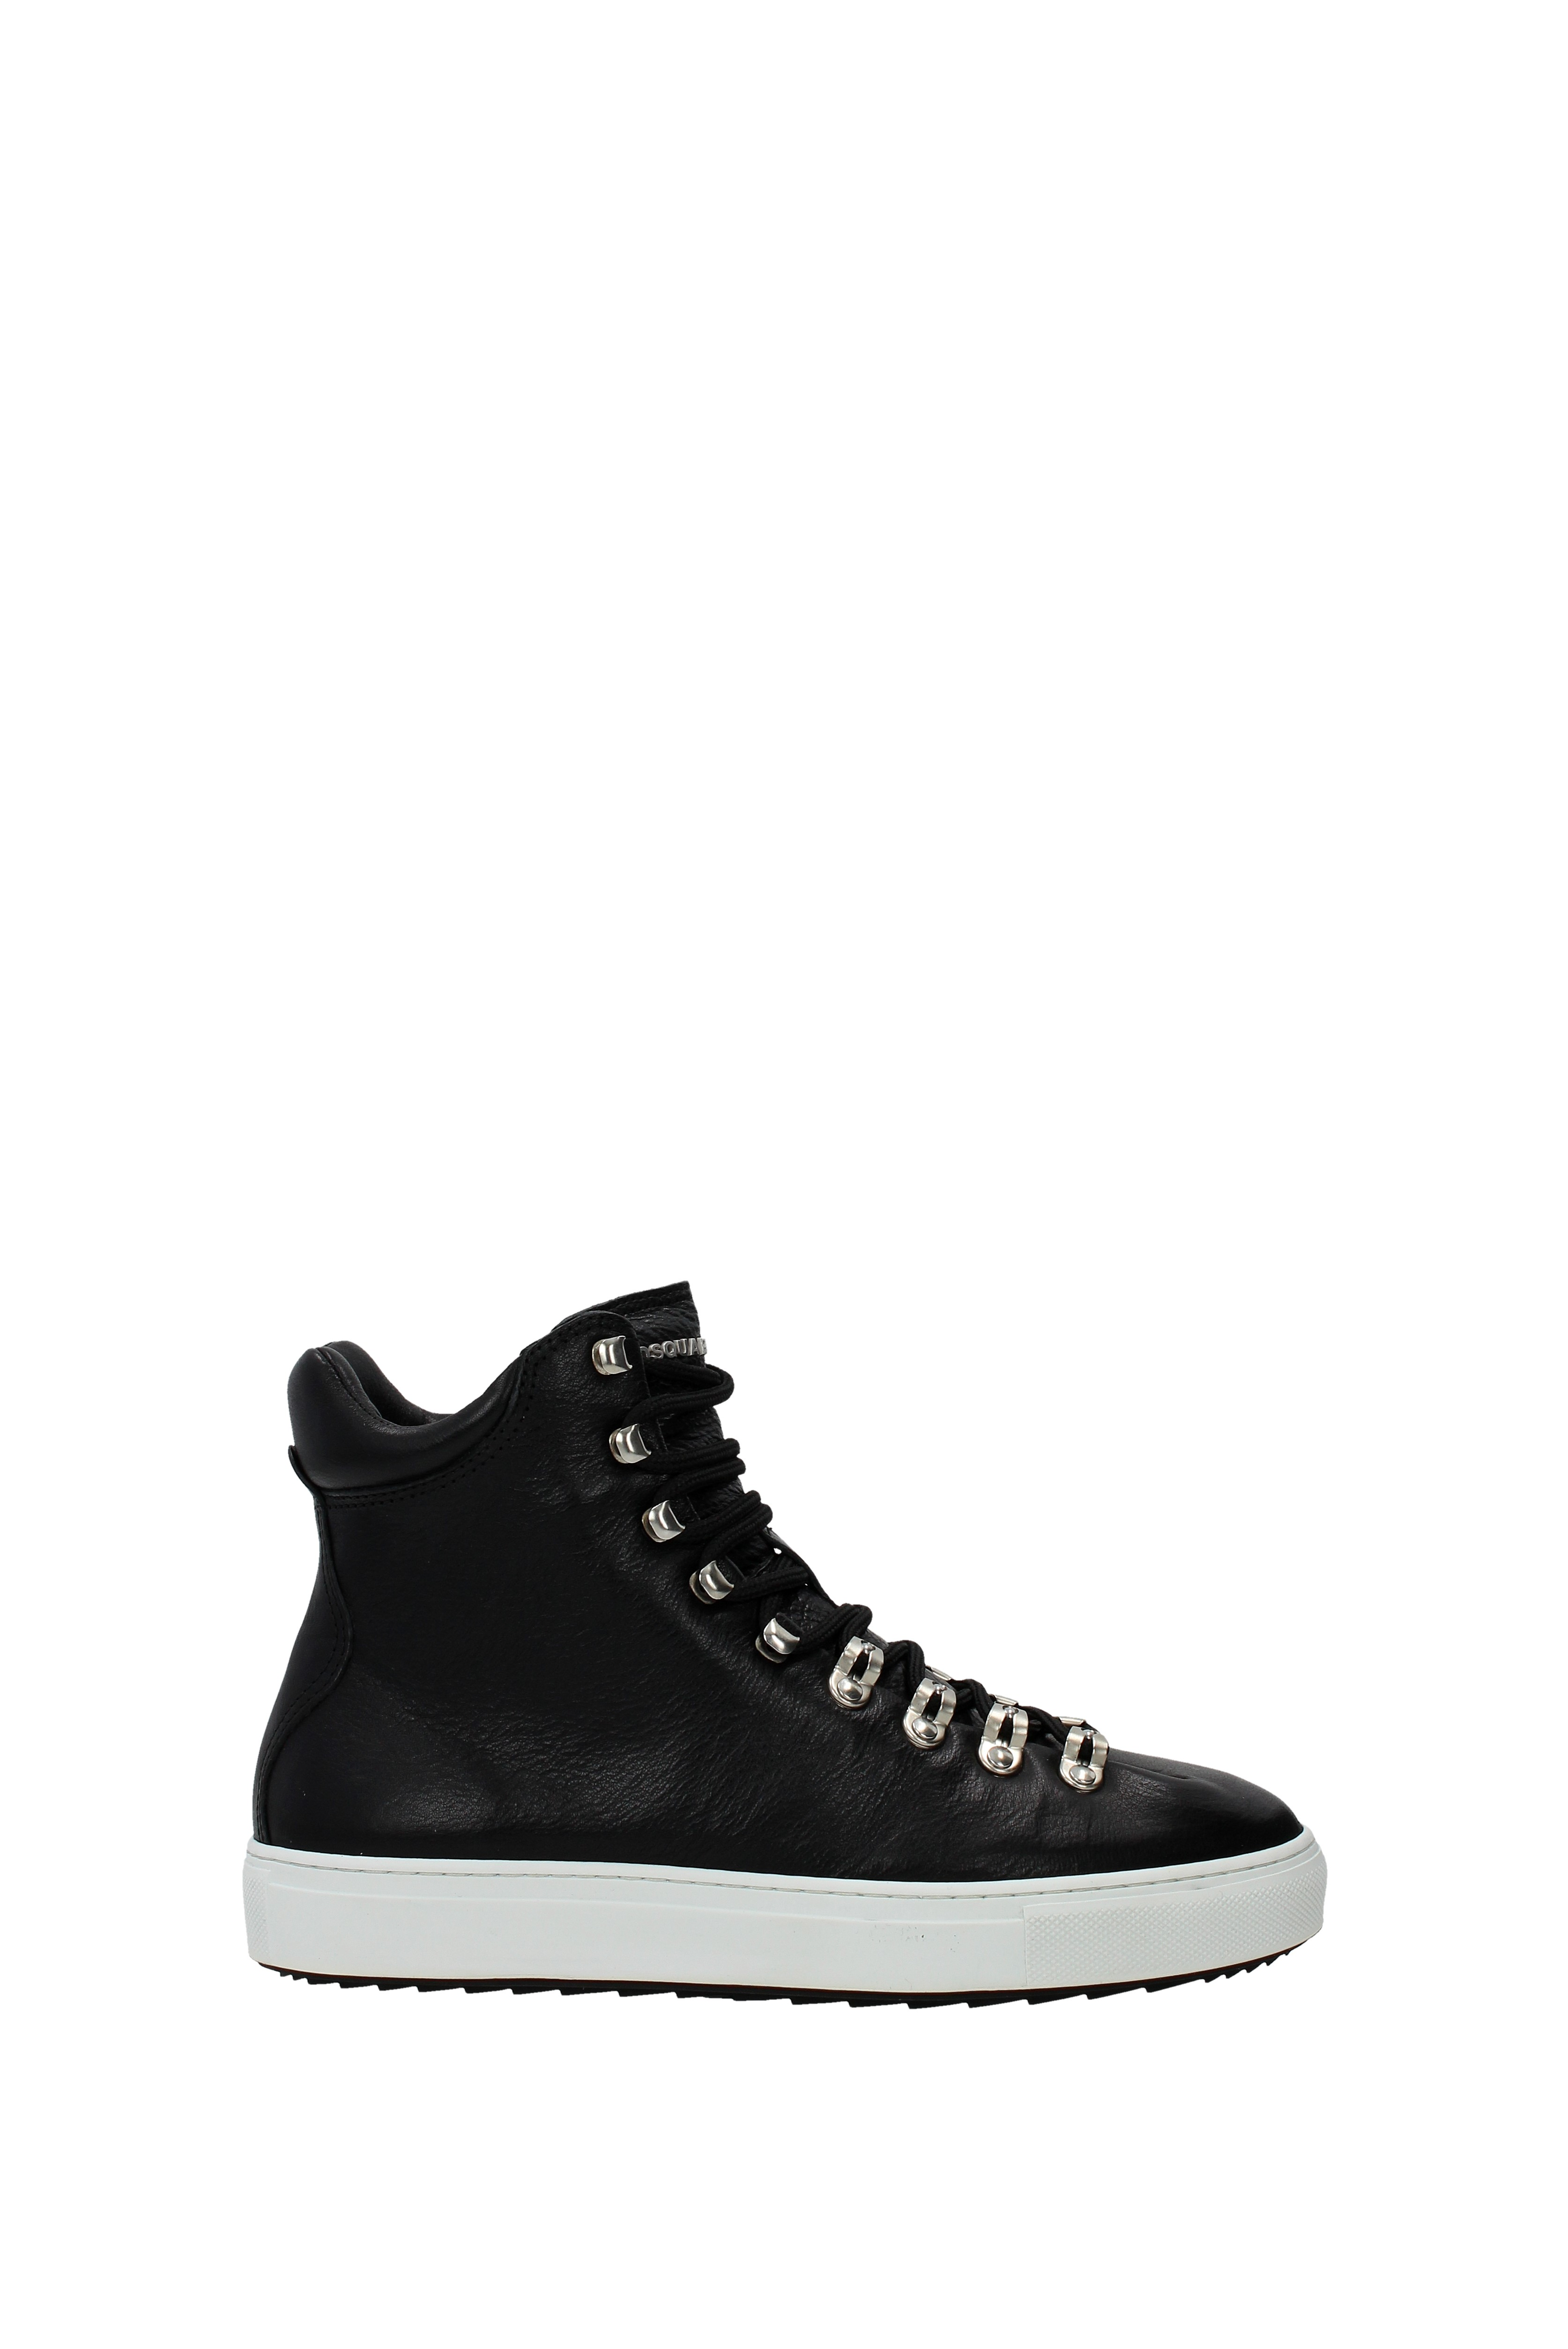 Sneakers Dsquared2 whistler Uomo - Pelle (SN117015)